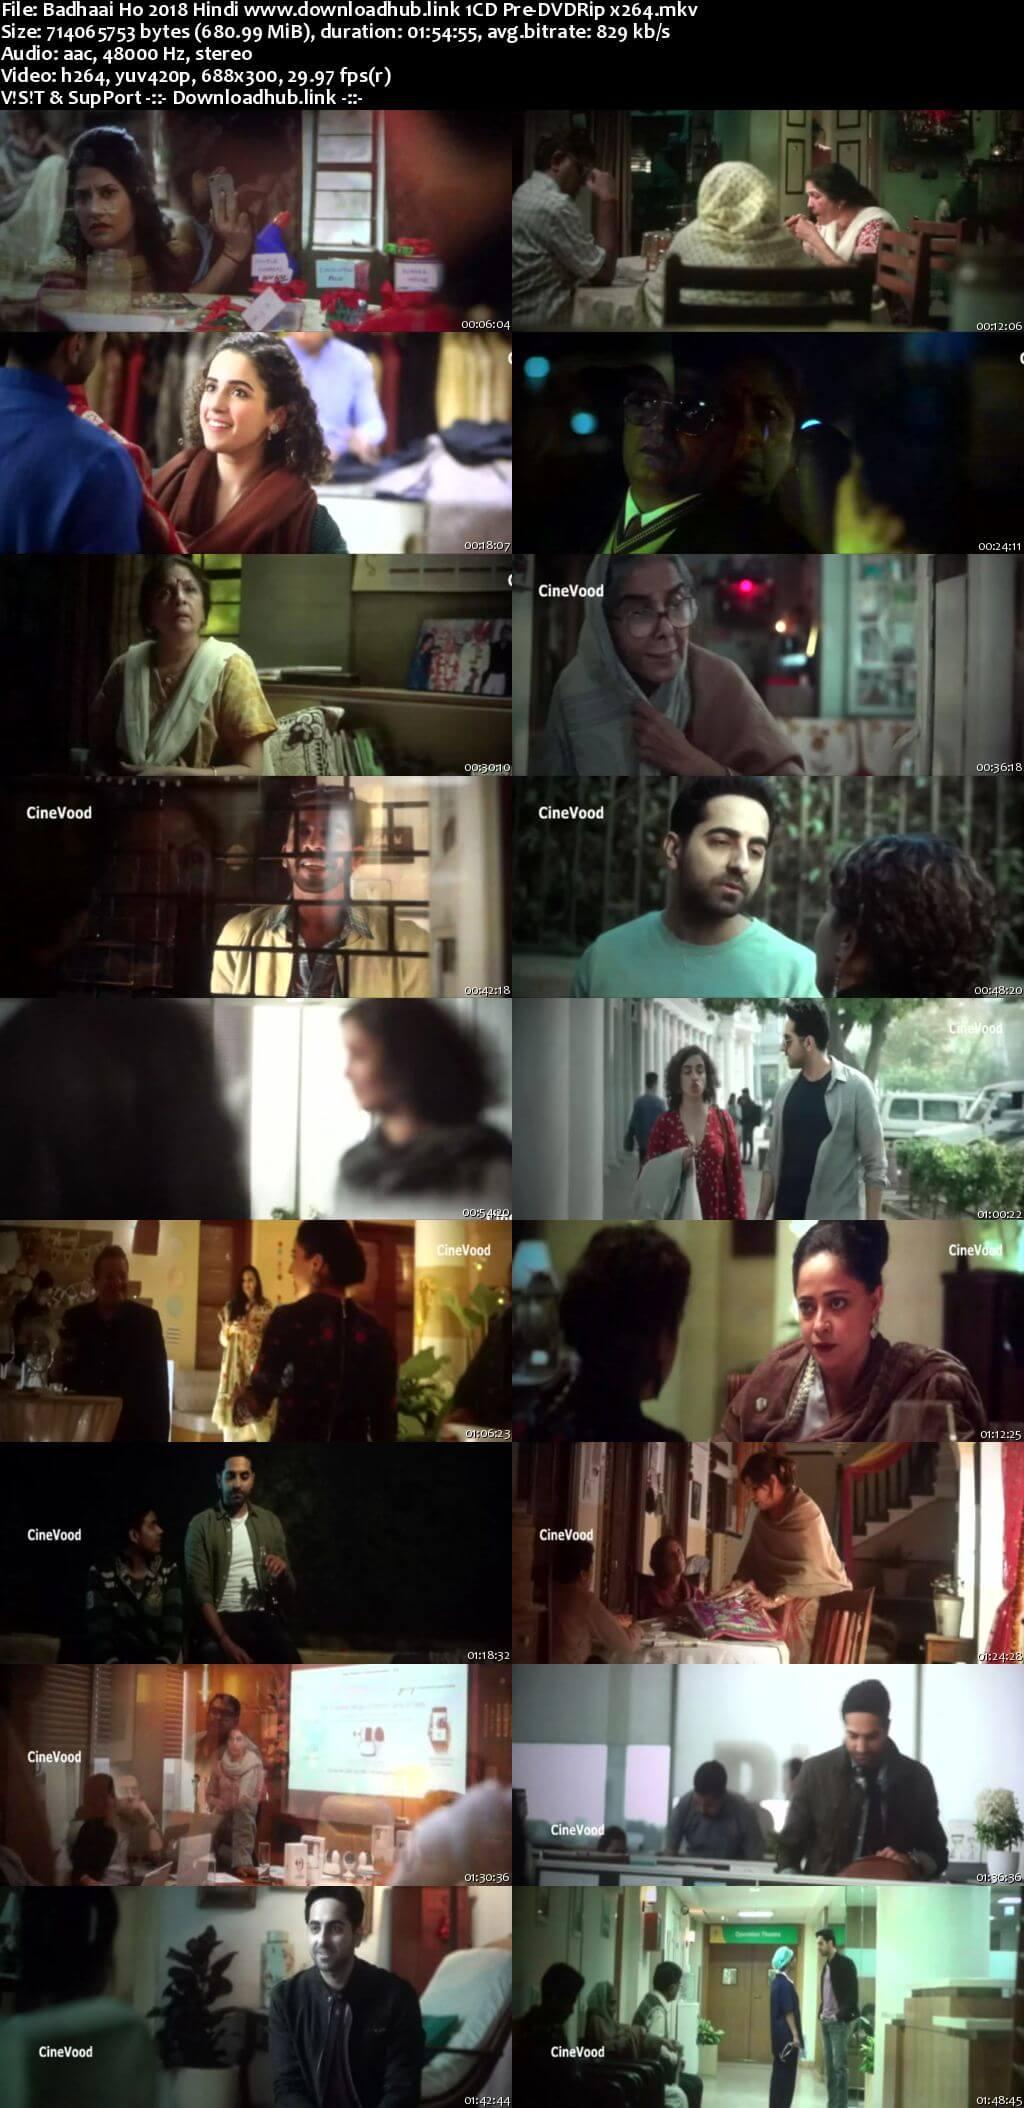 Badhaai Ho 2018 Hindi 700MB Pre-DVDRip x264